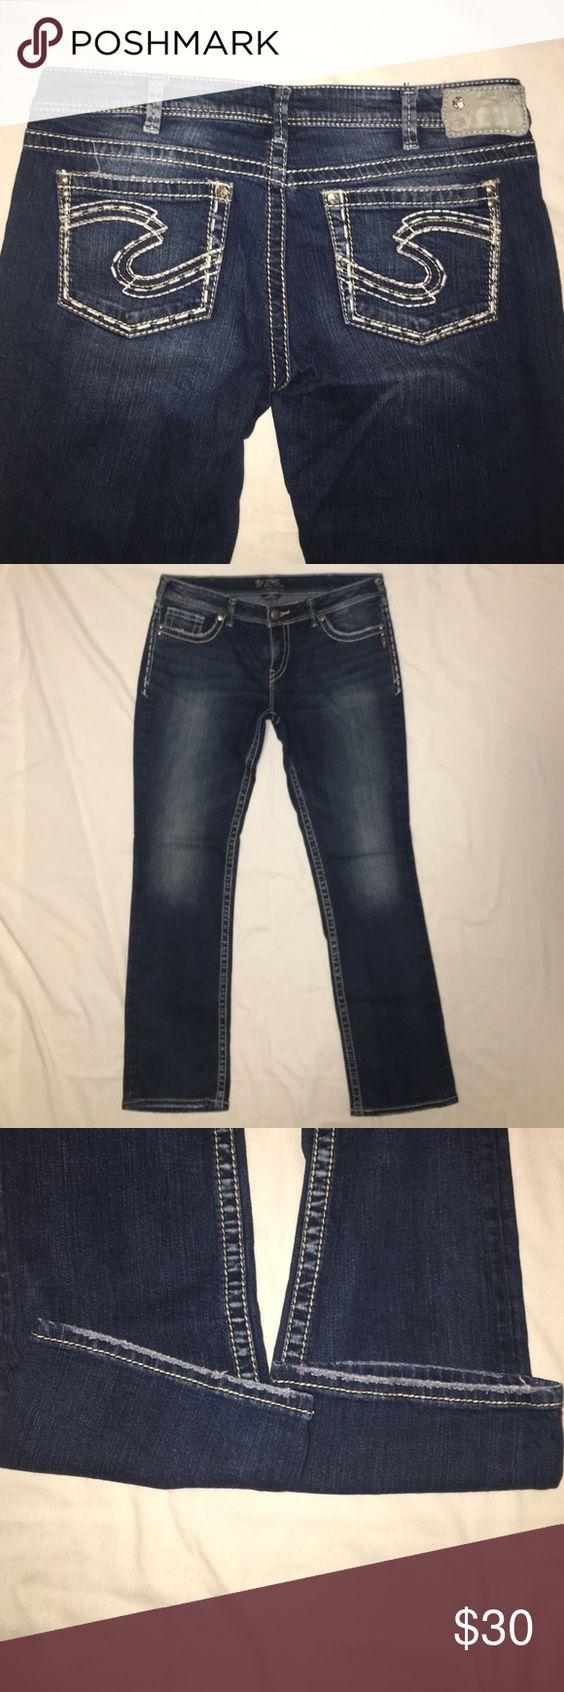 Silver Jeans Aiko W34/L33